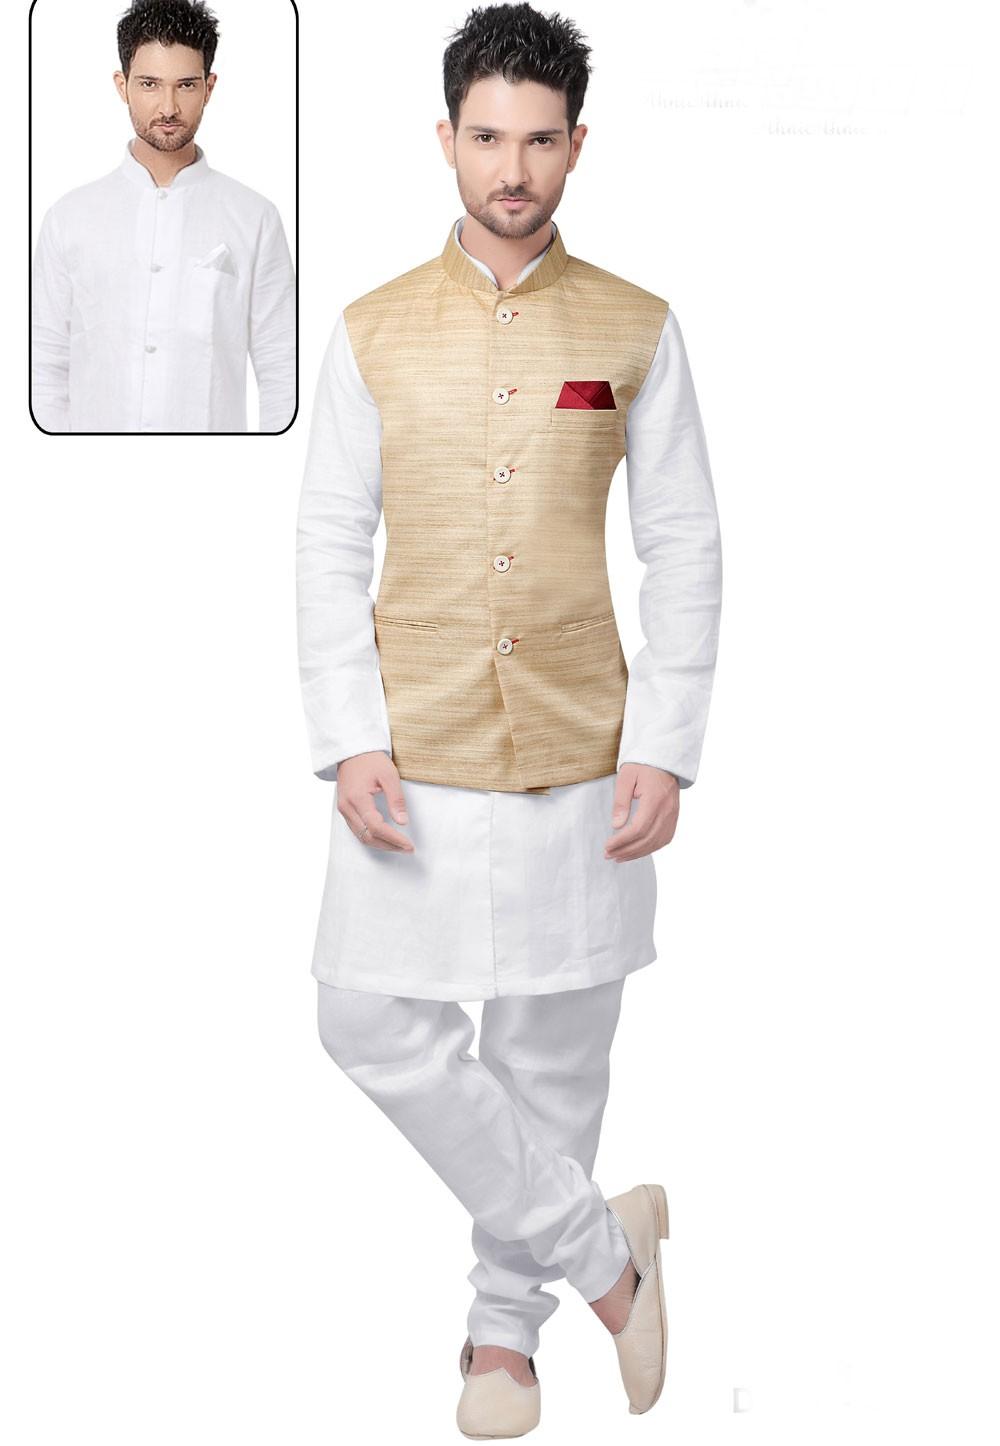 Men's Linen White,Cream Color Readymade Kurta Pajama.